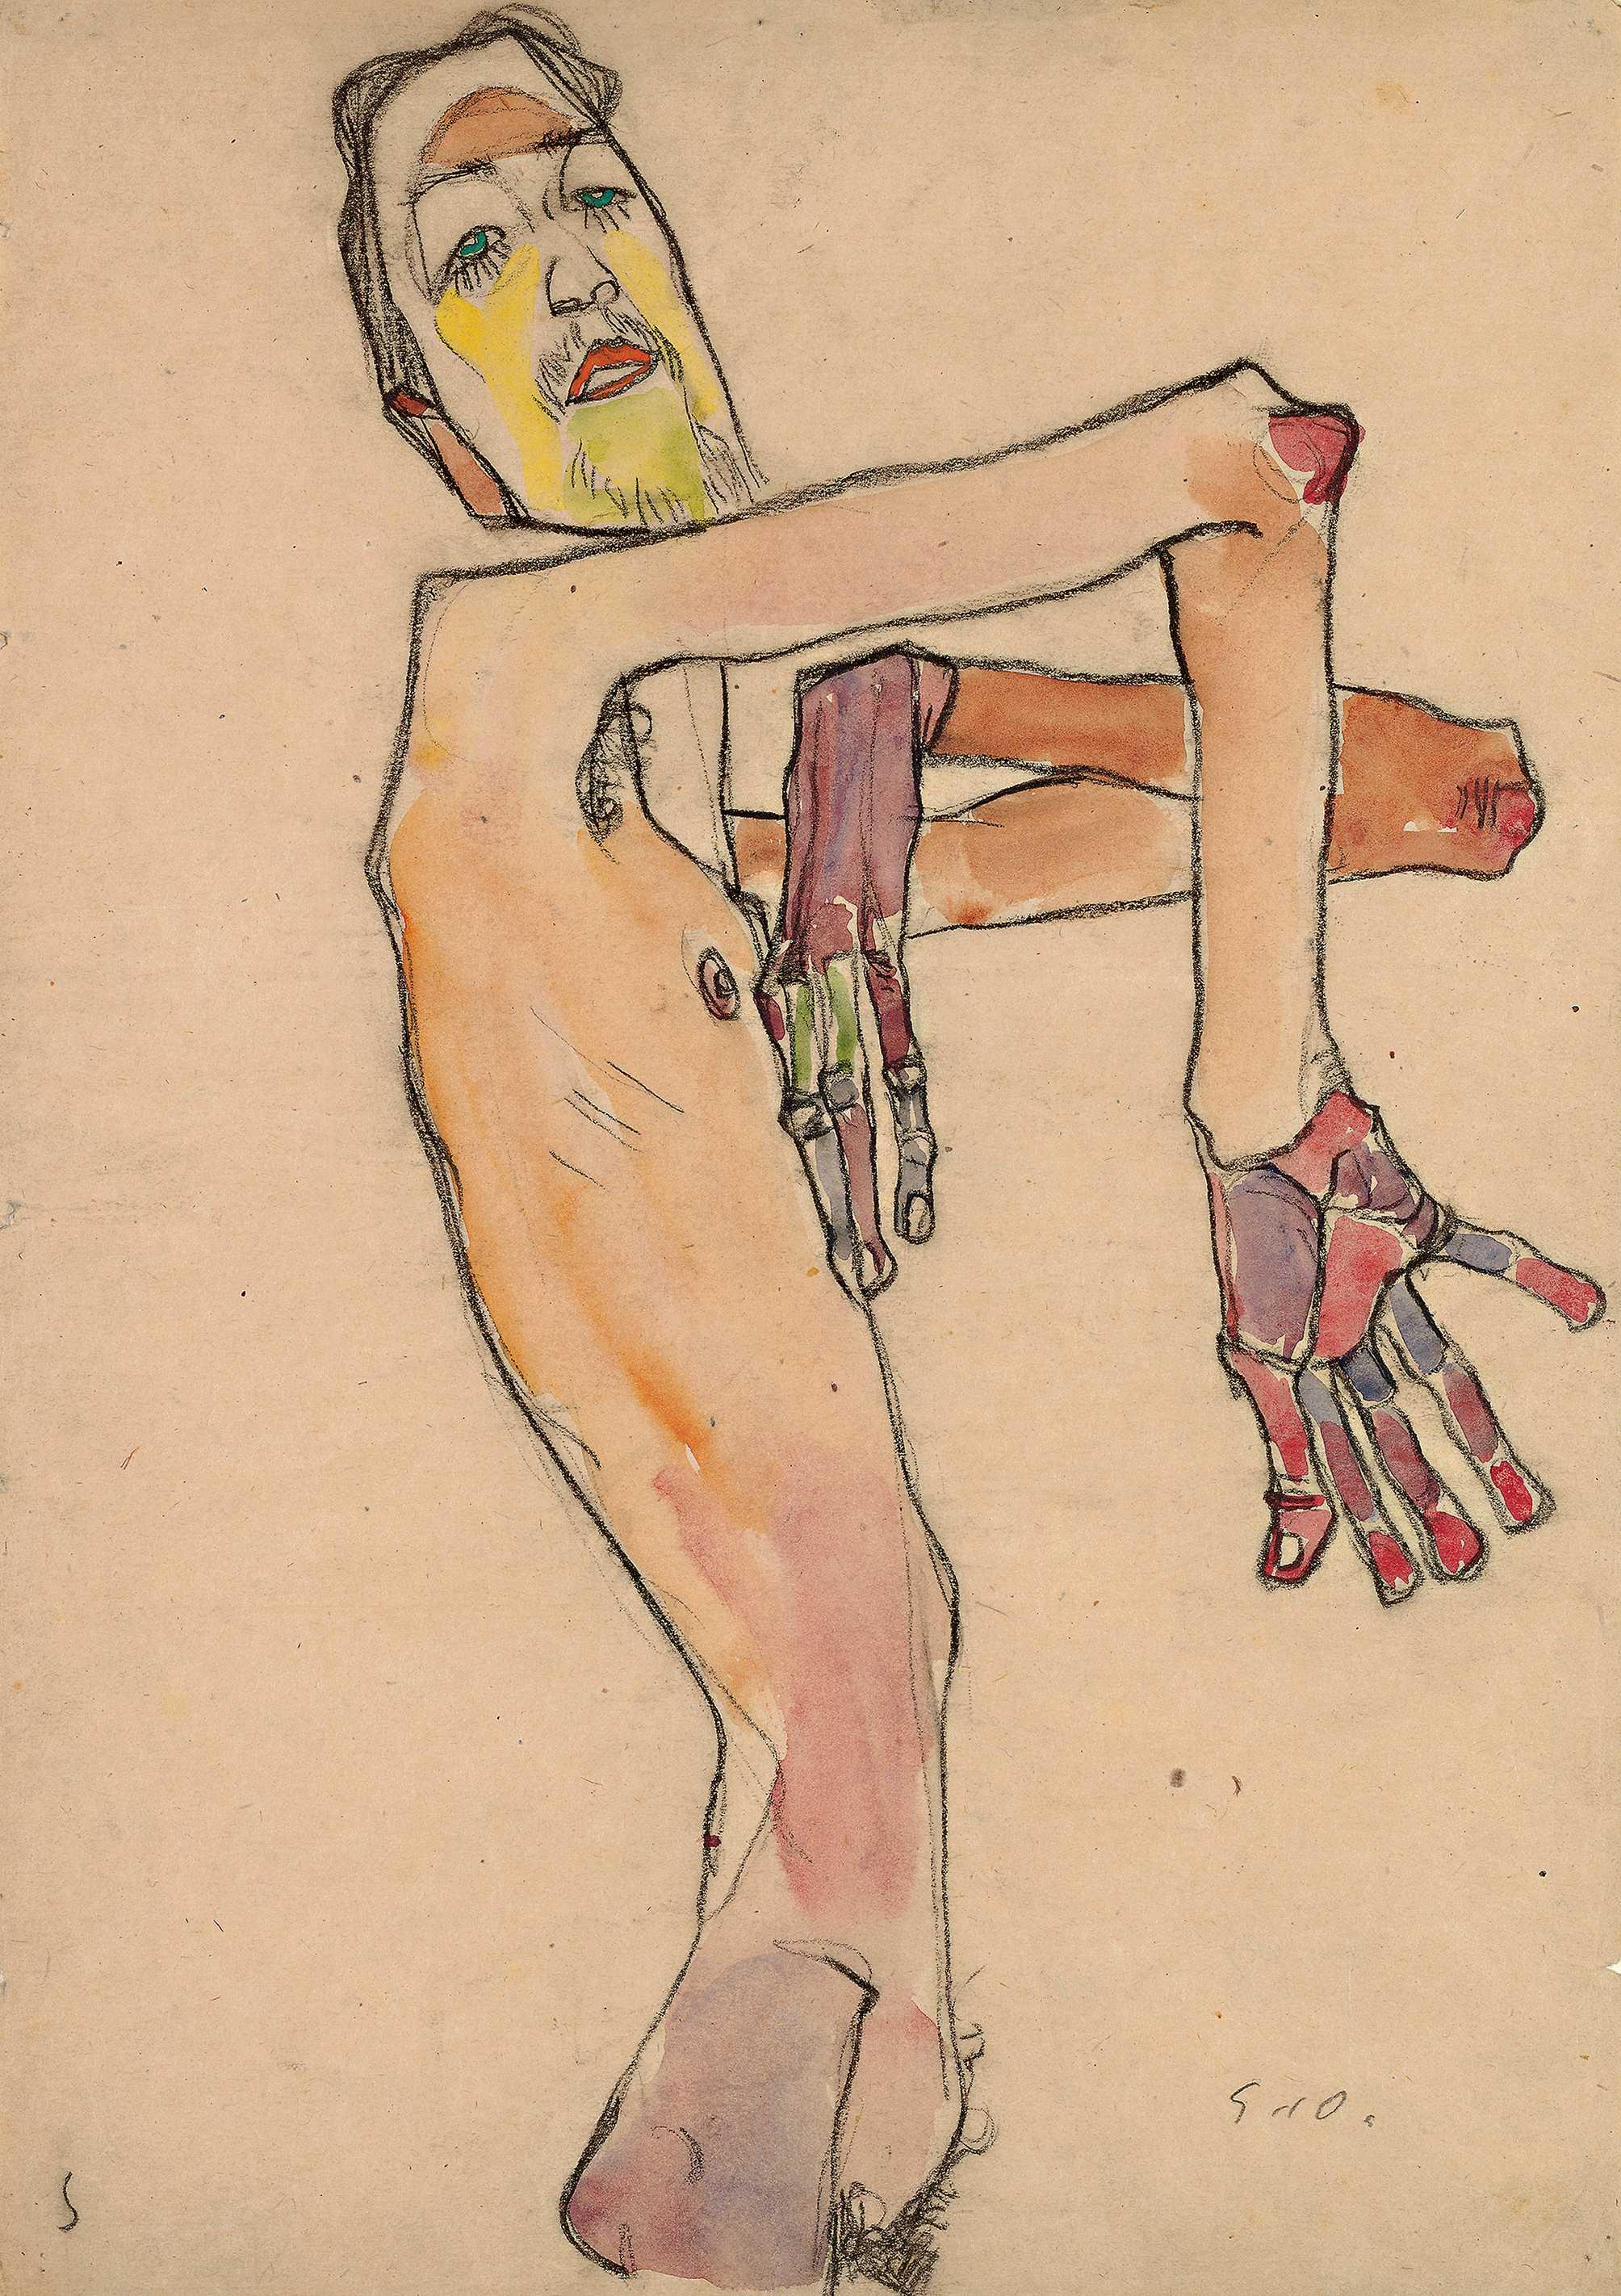 EGON SCHIELE Erwin Dominik Osen als Akt mit überkreuzten Armen, 1910 © Leopold Museum, Wien Foto: Leopold Museum, Wien/ Manfred Thumberger